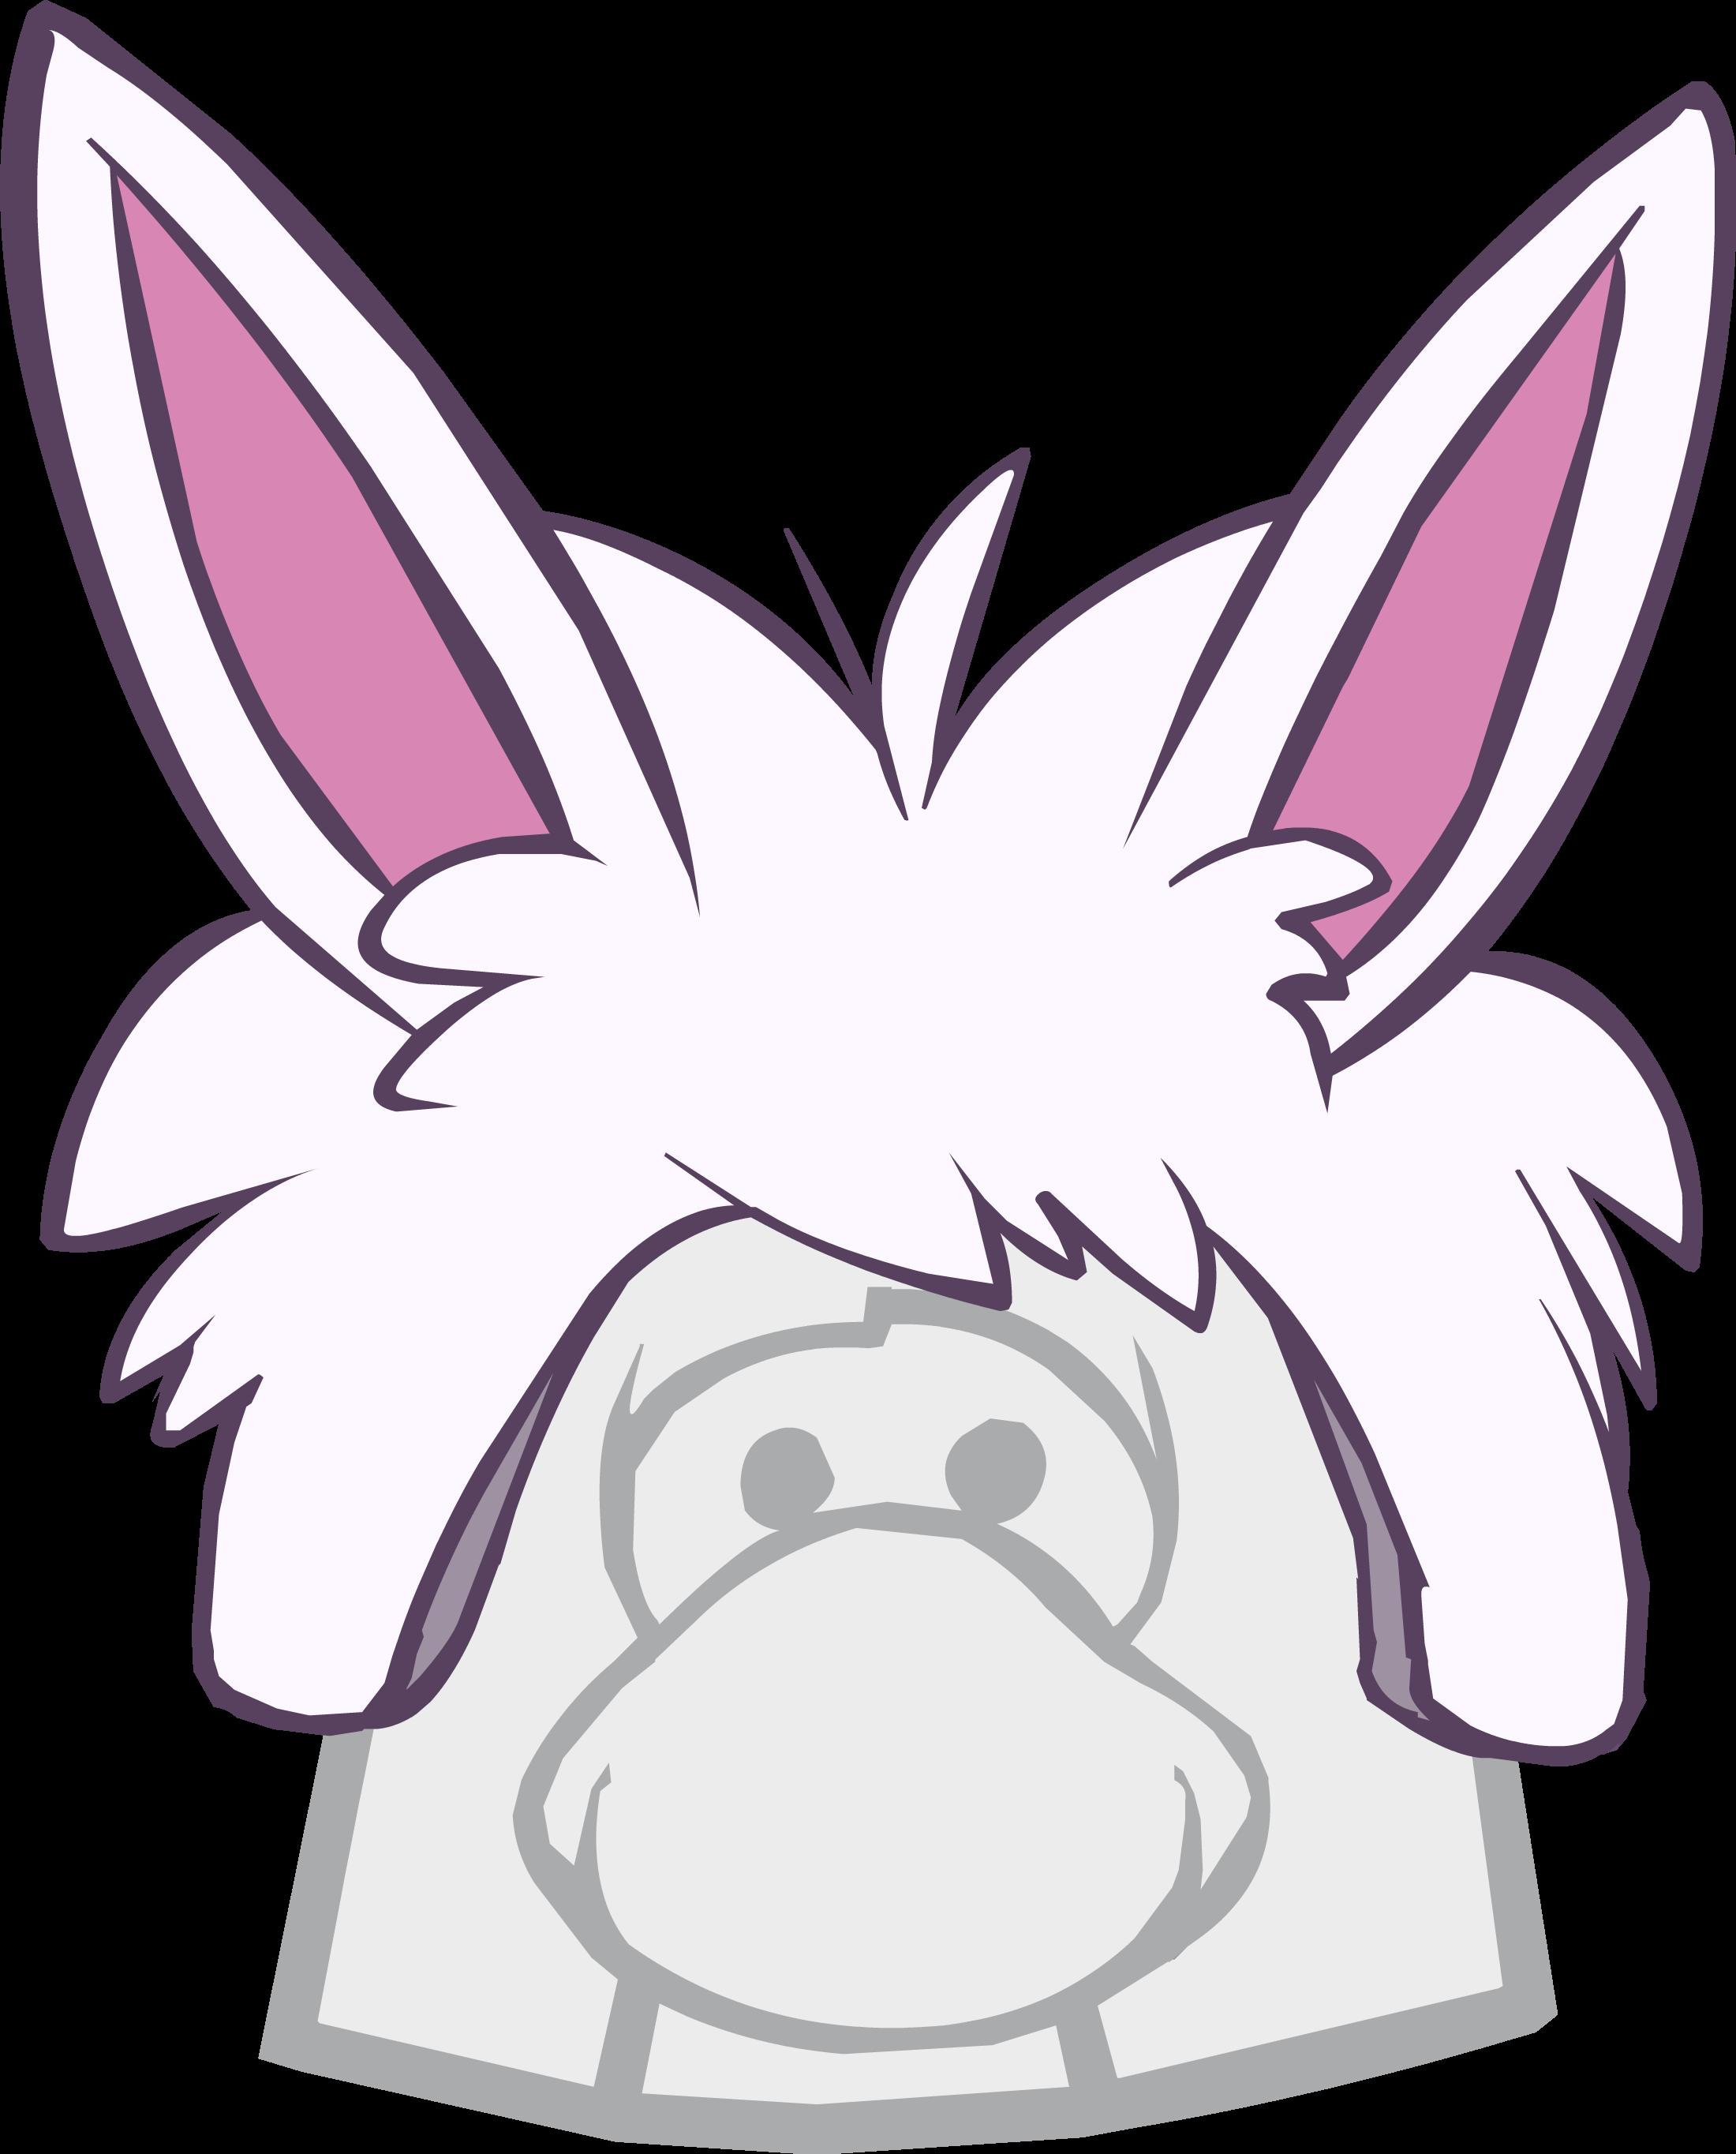 Gorro de Puffle Conejo